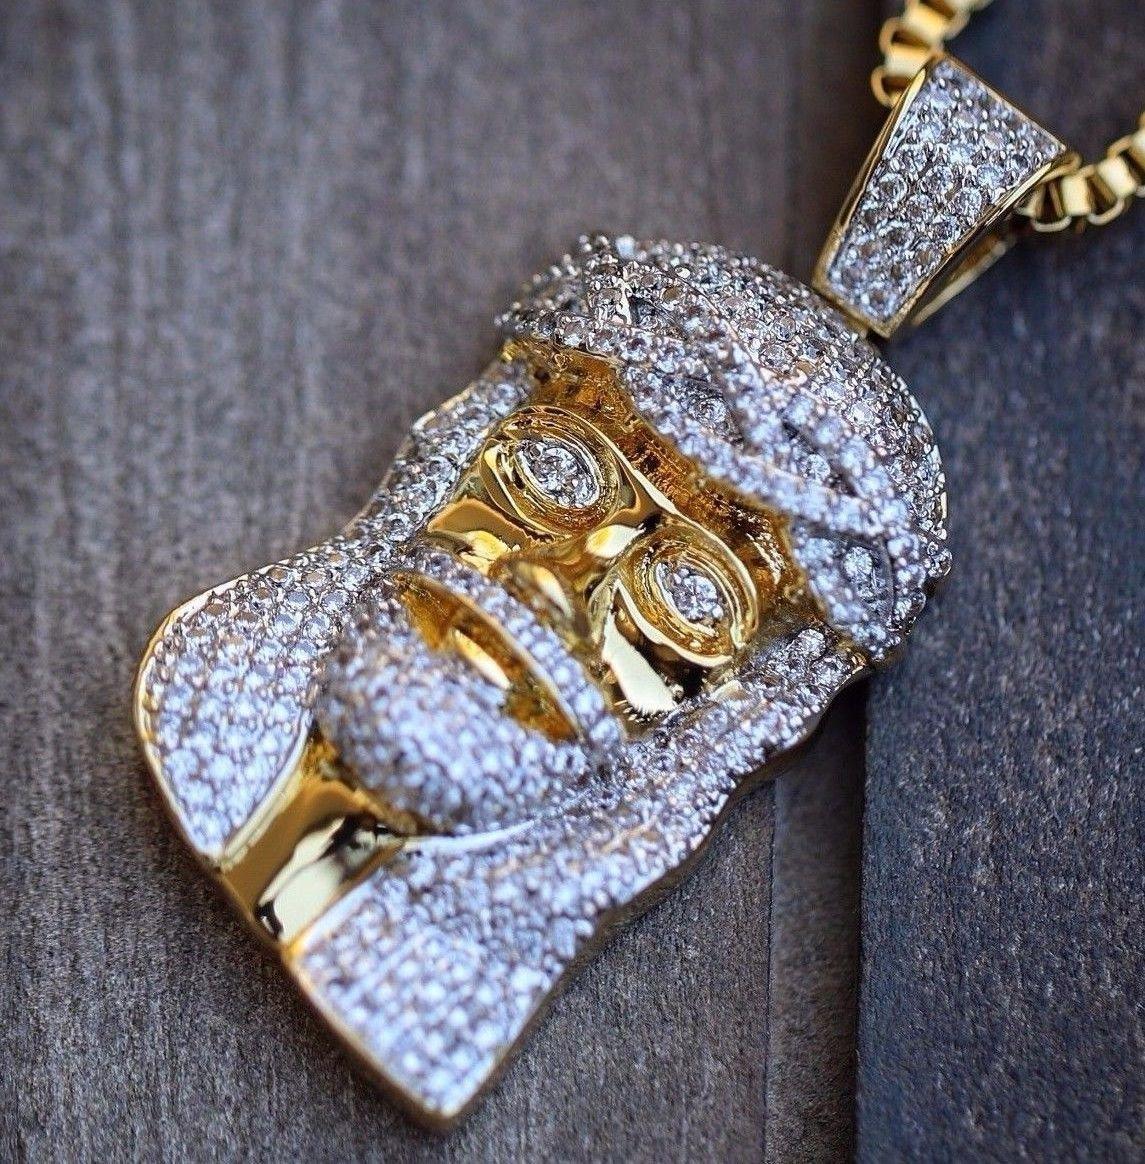 18k Gold Plated Iced Out Lab Diamond Mini Hip Hop Jesus Piece Necklace